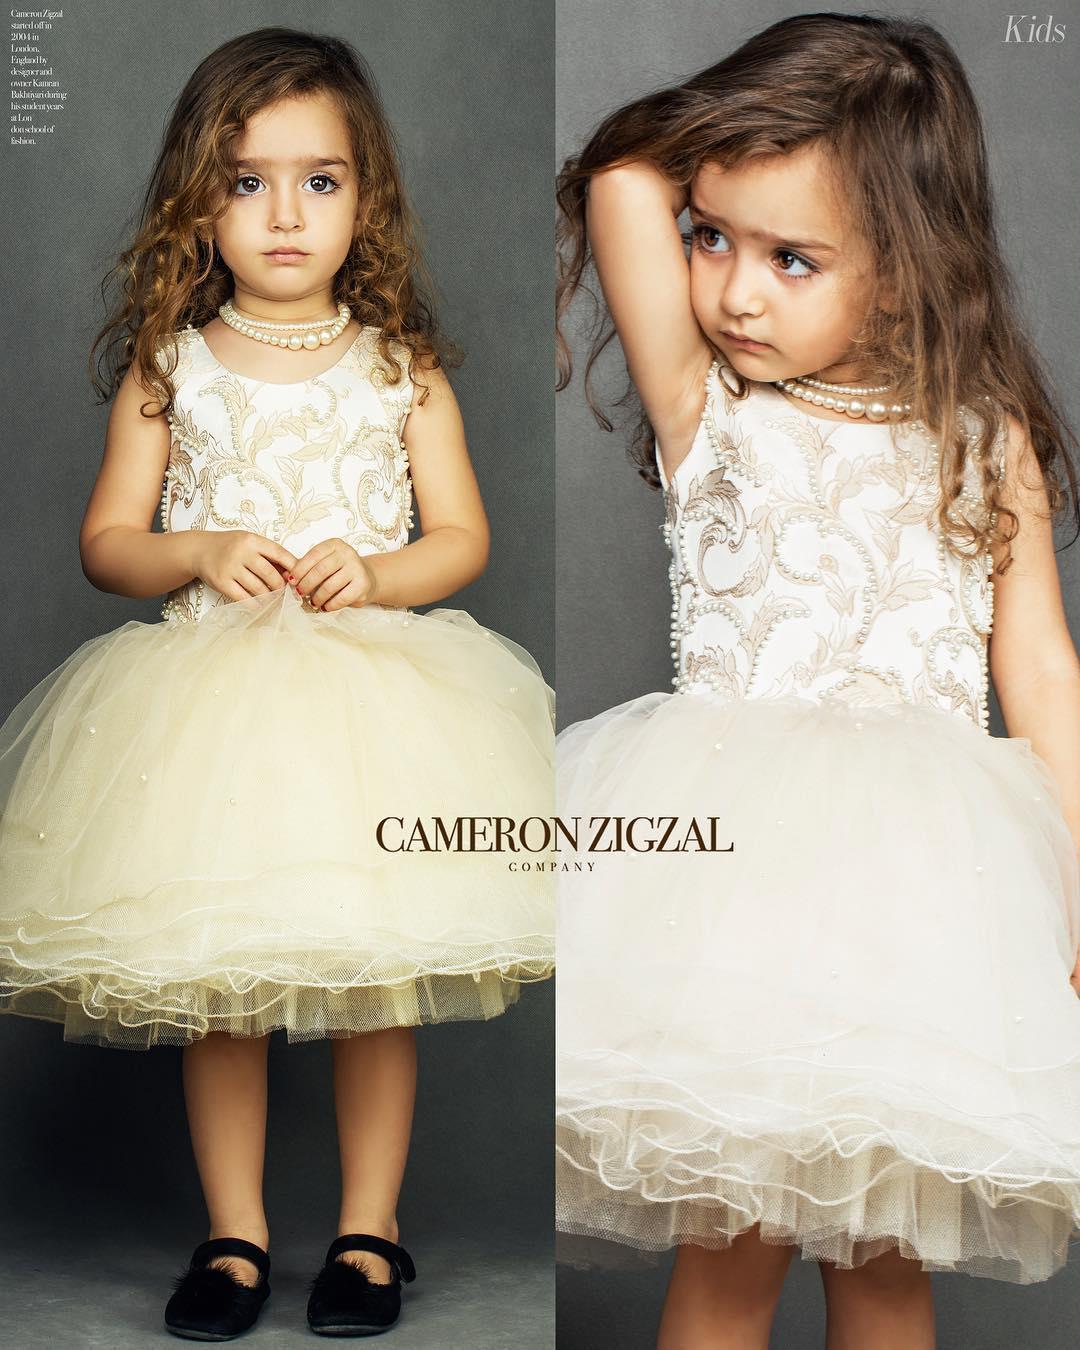 کالکشن بچگانه کمرون زیگزال ویم